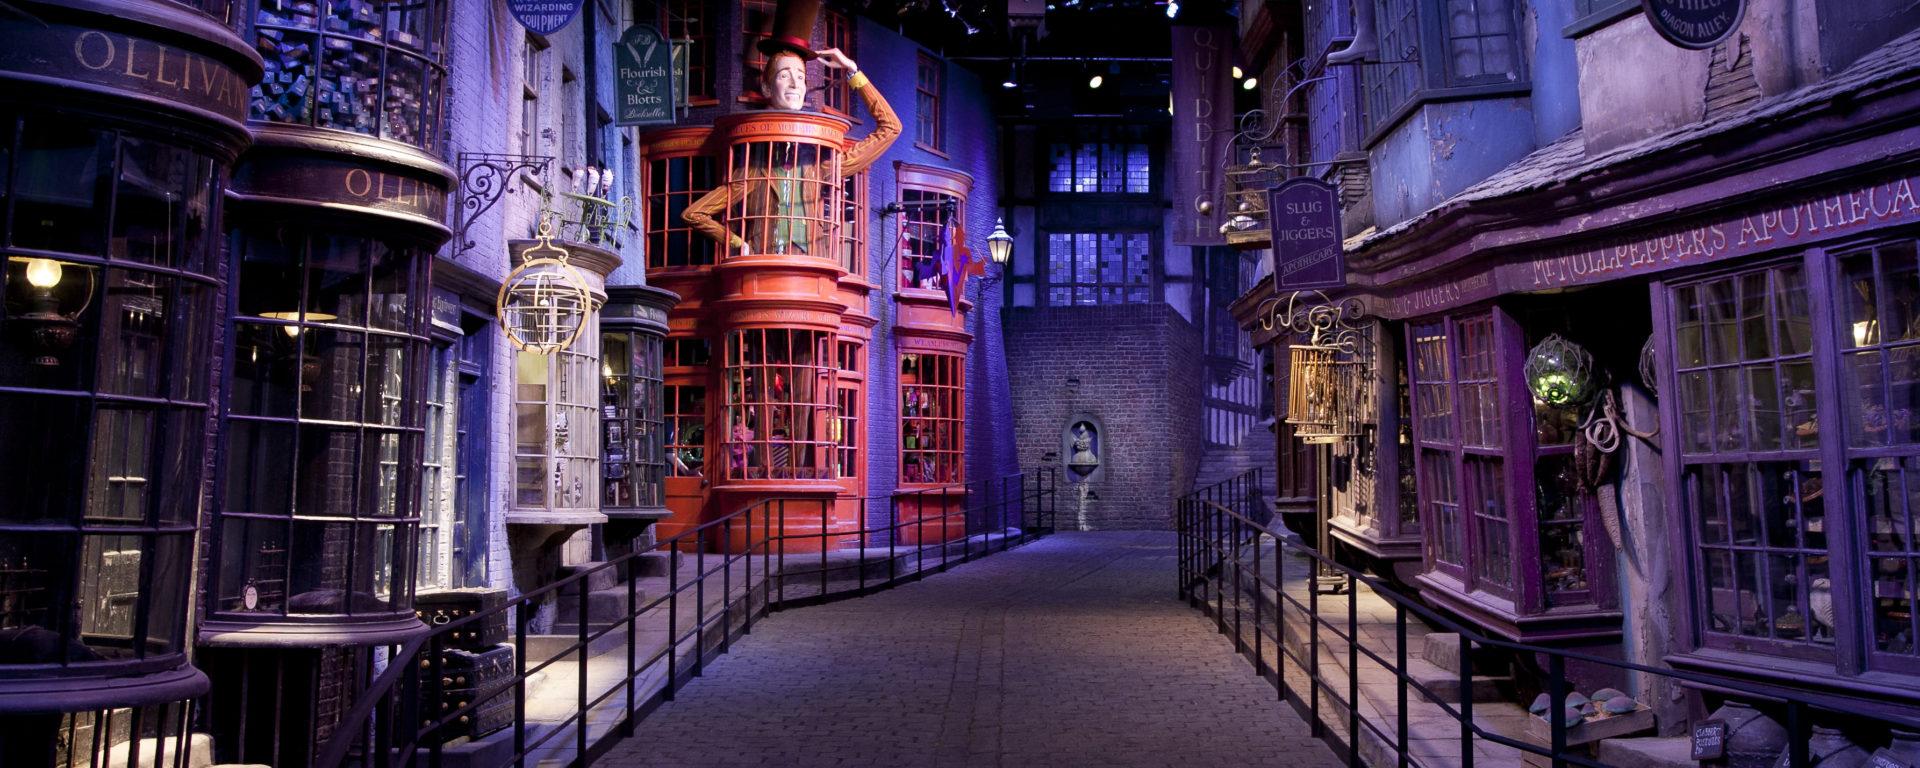 Making Of Harry Potter Tour - London